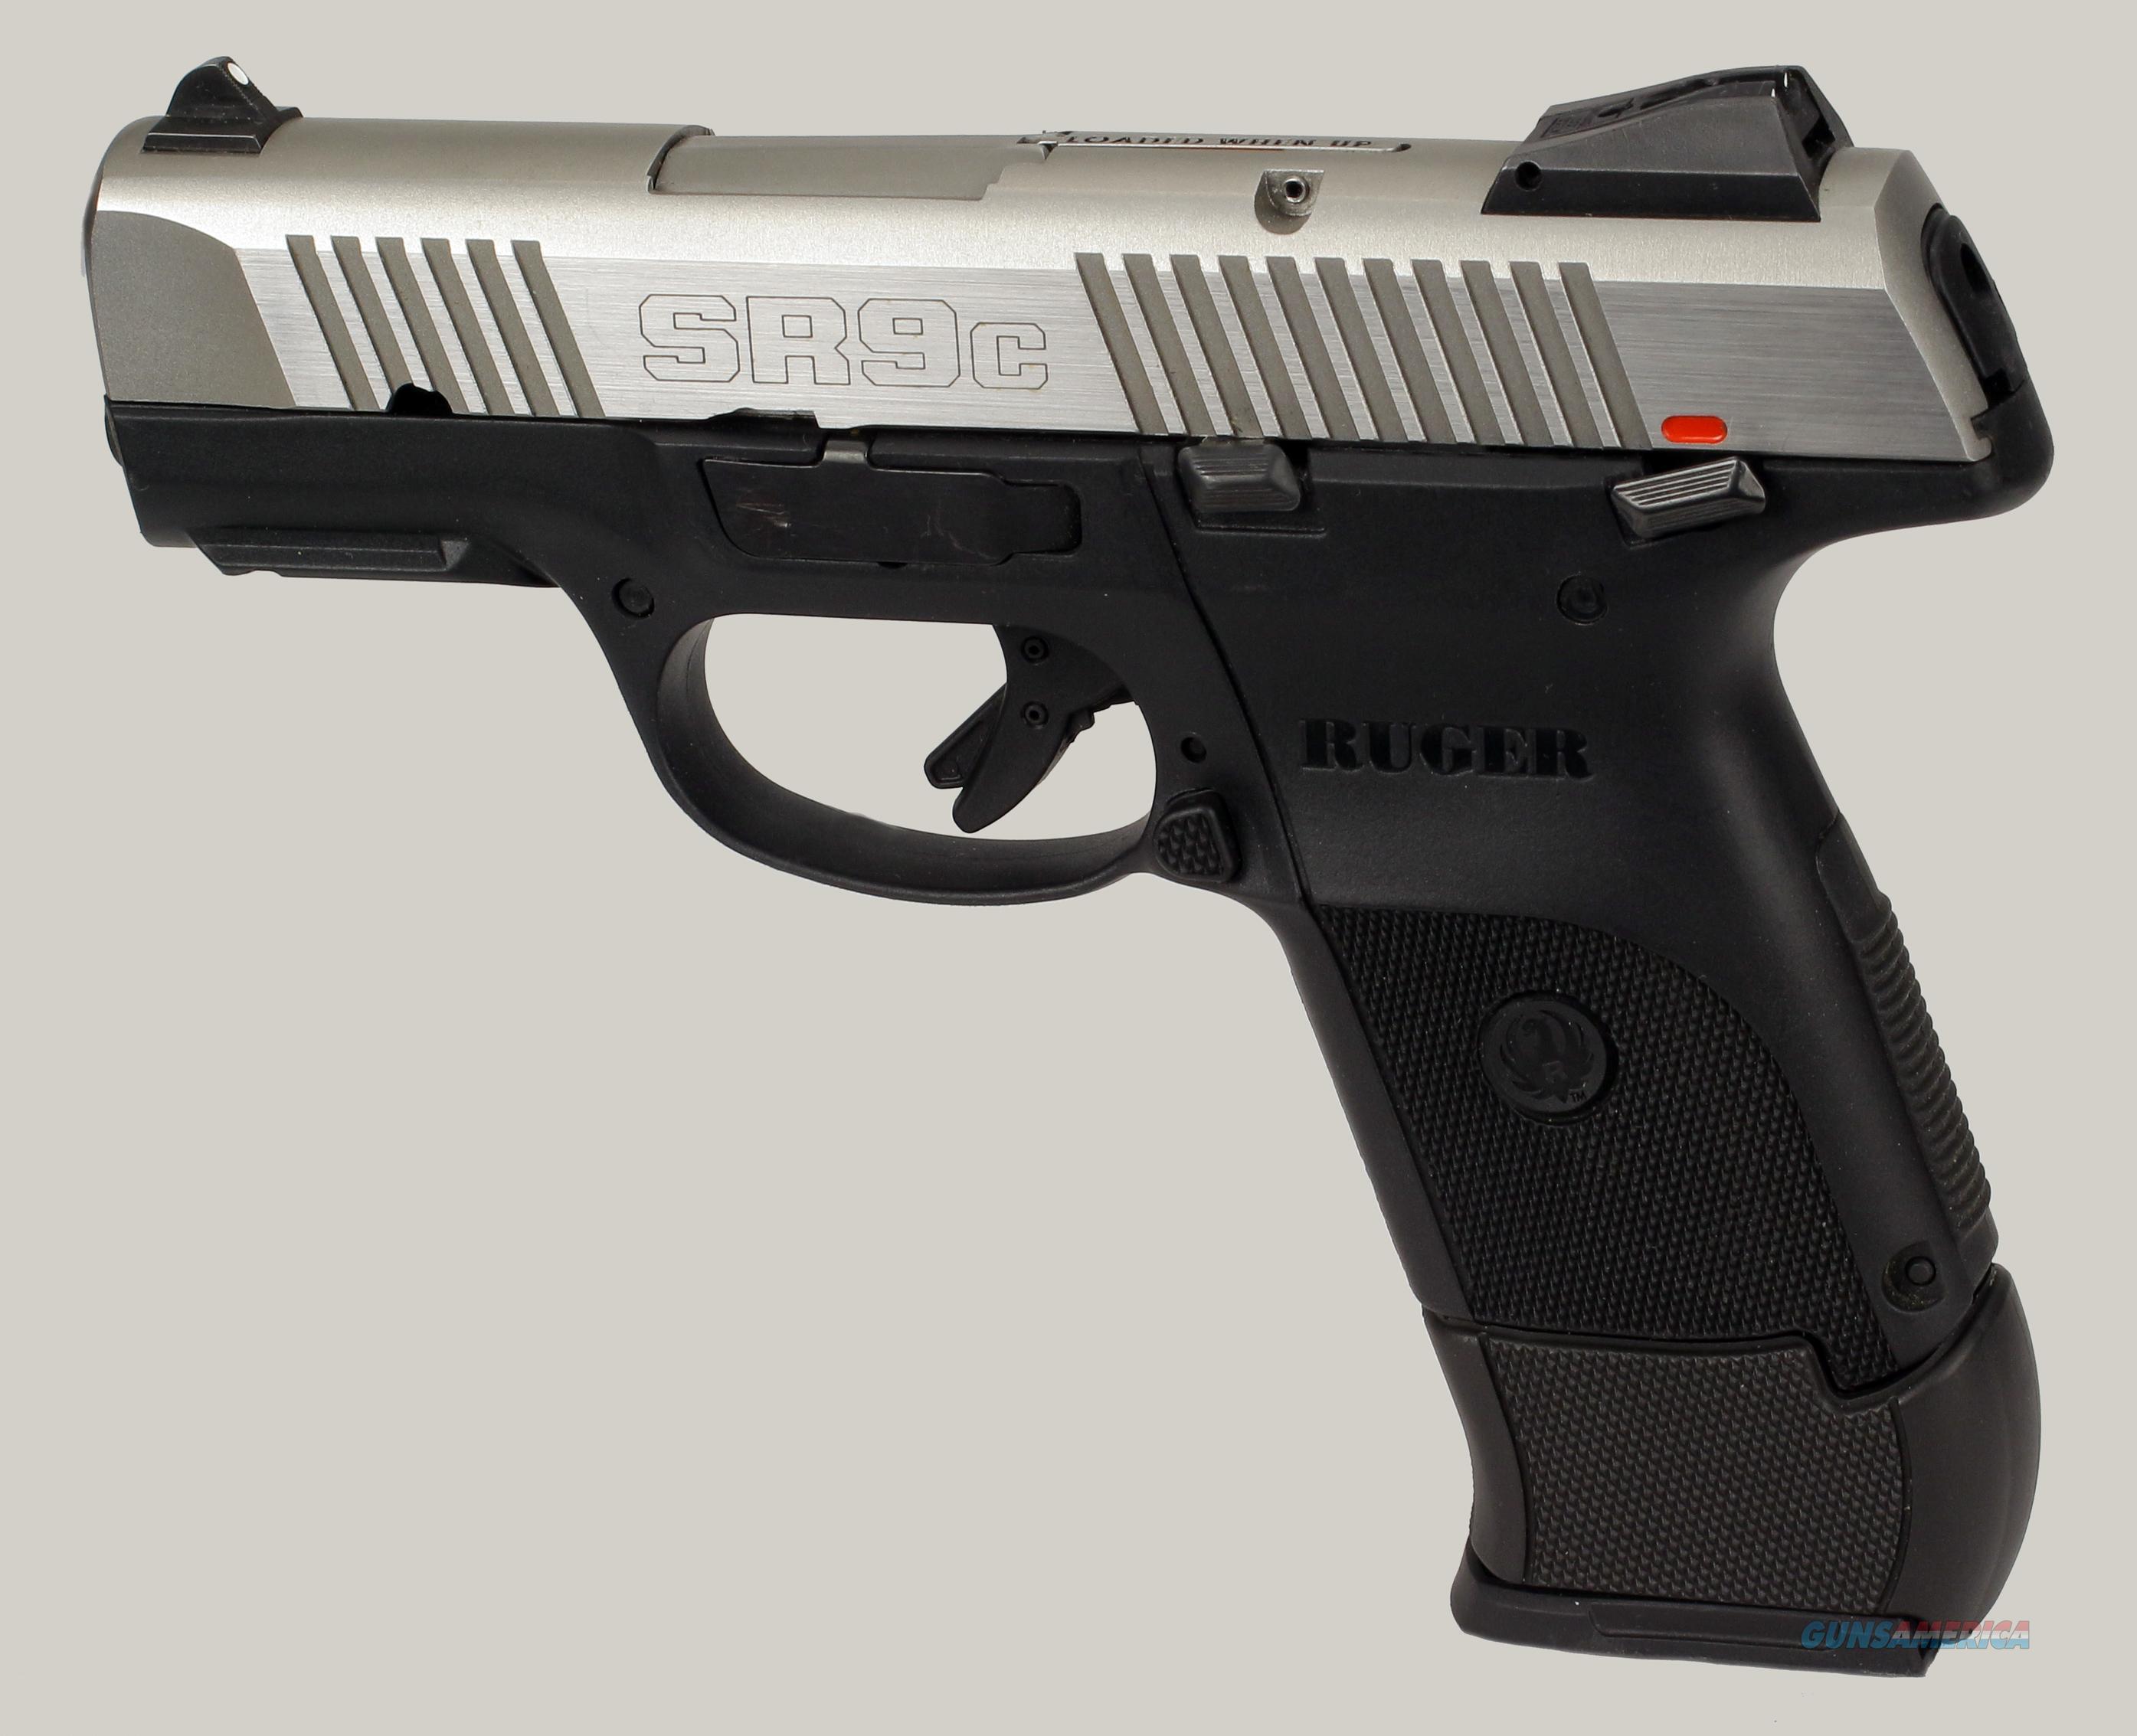 Midwest Auto Sales >> Ruger SR9C 9mm Pistol for sale